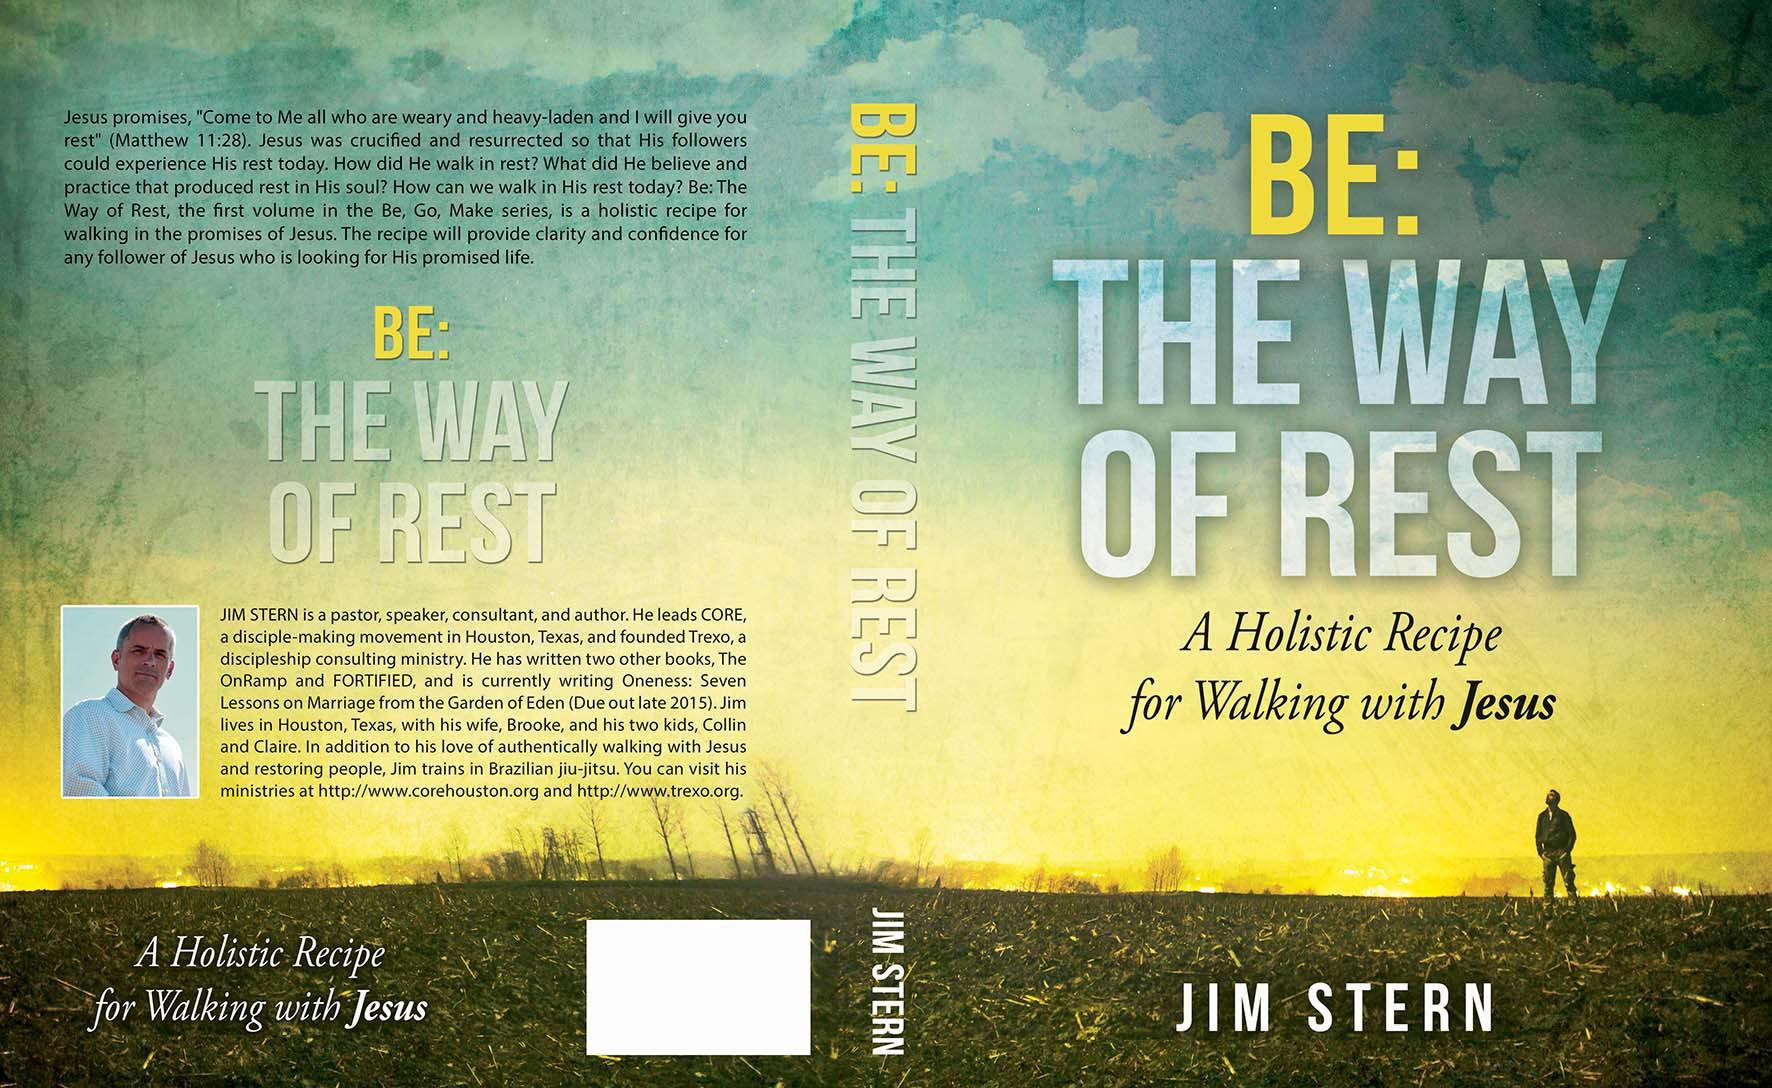 Create a peaceful book cover for an inspiring Christian workbook.